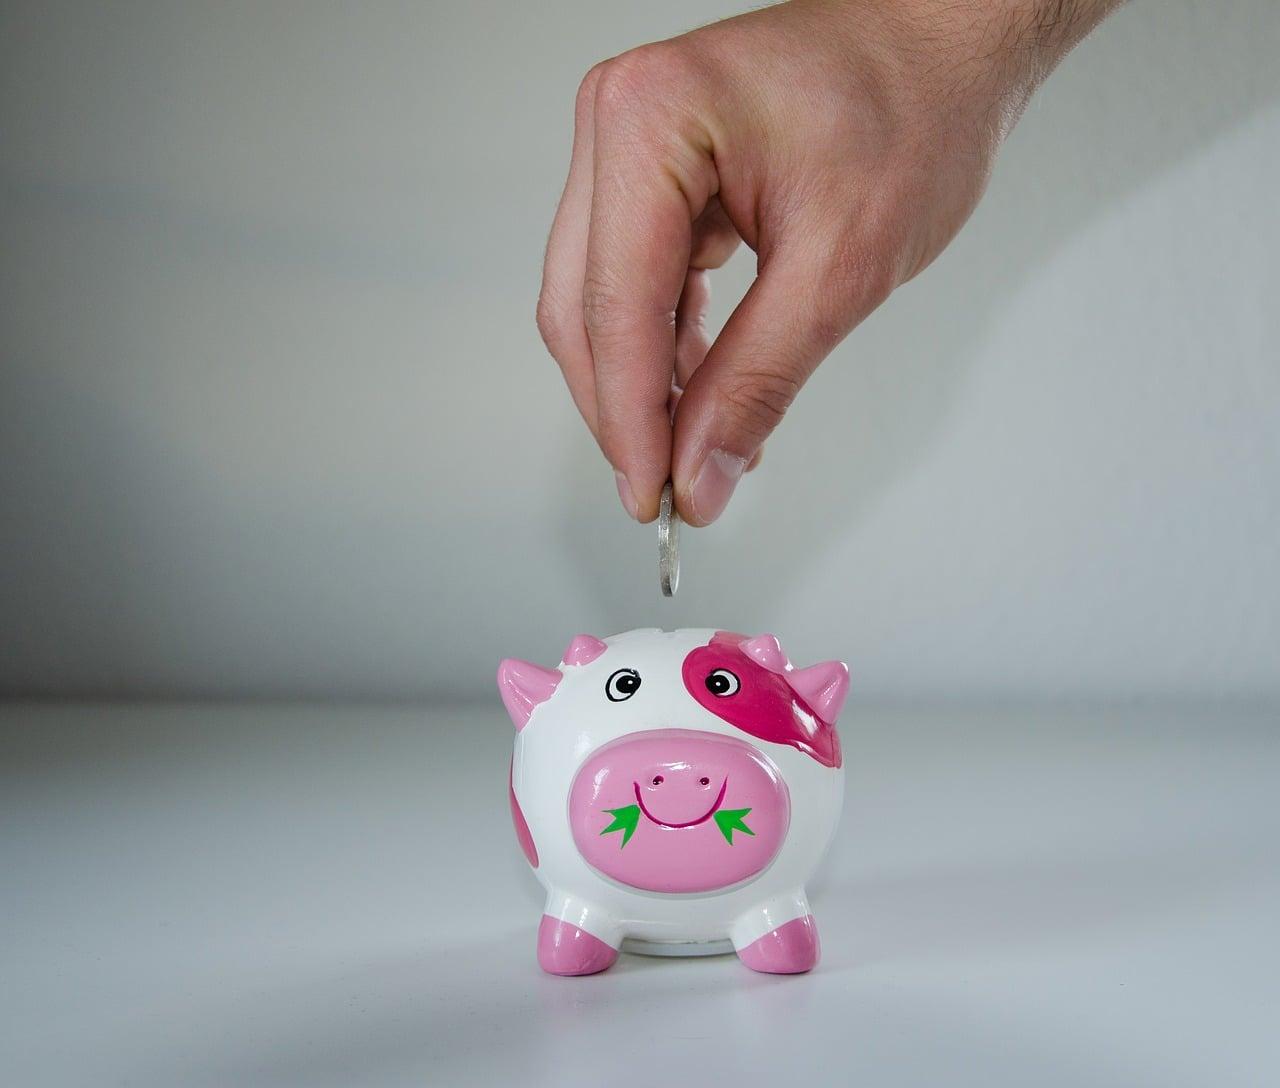 20 Ways to Save Money on Everyday Expenses